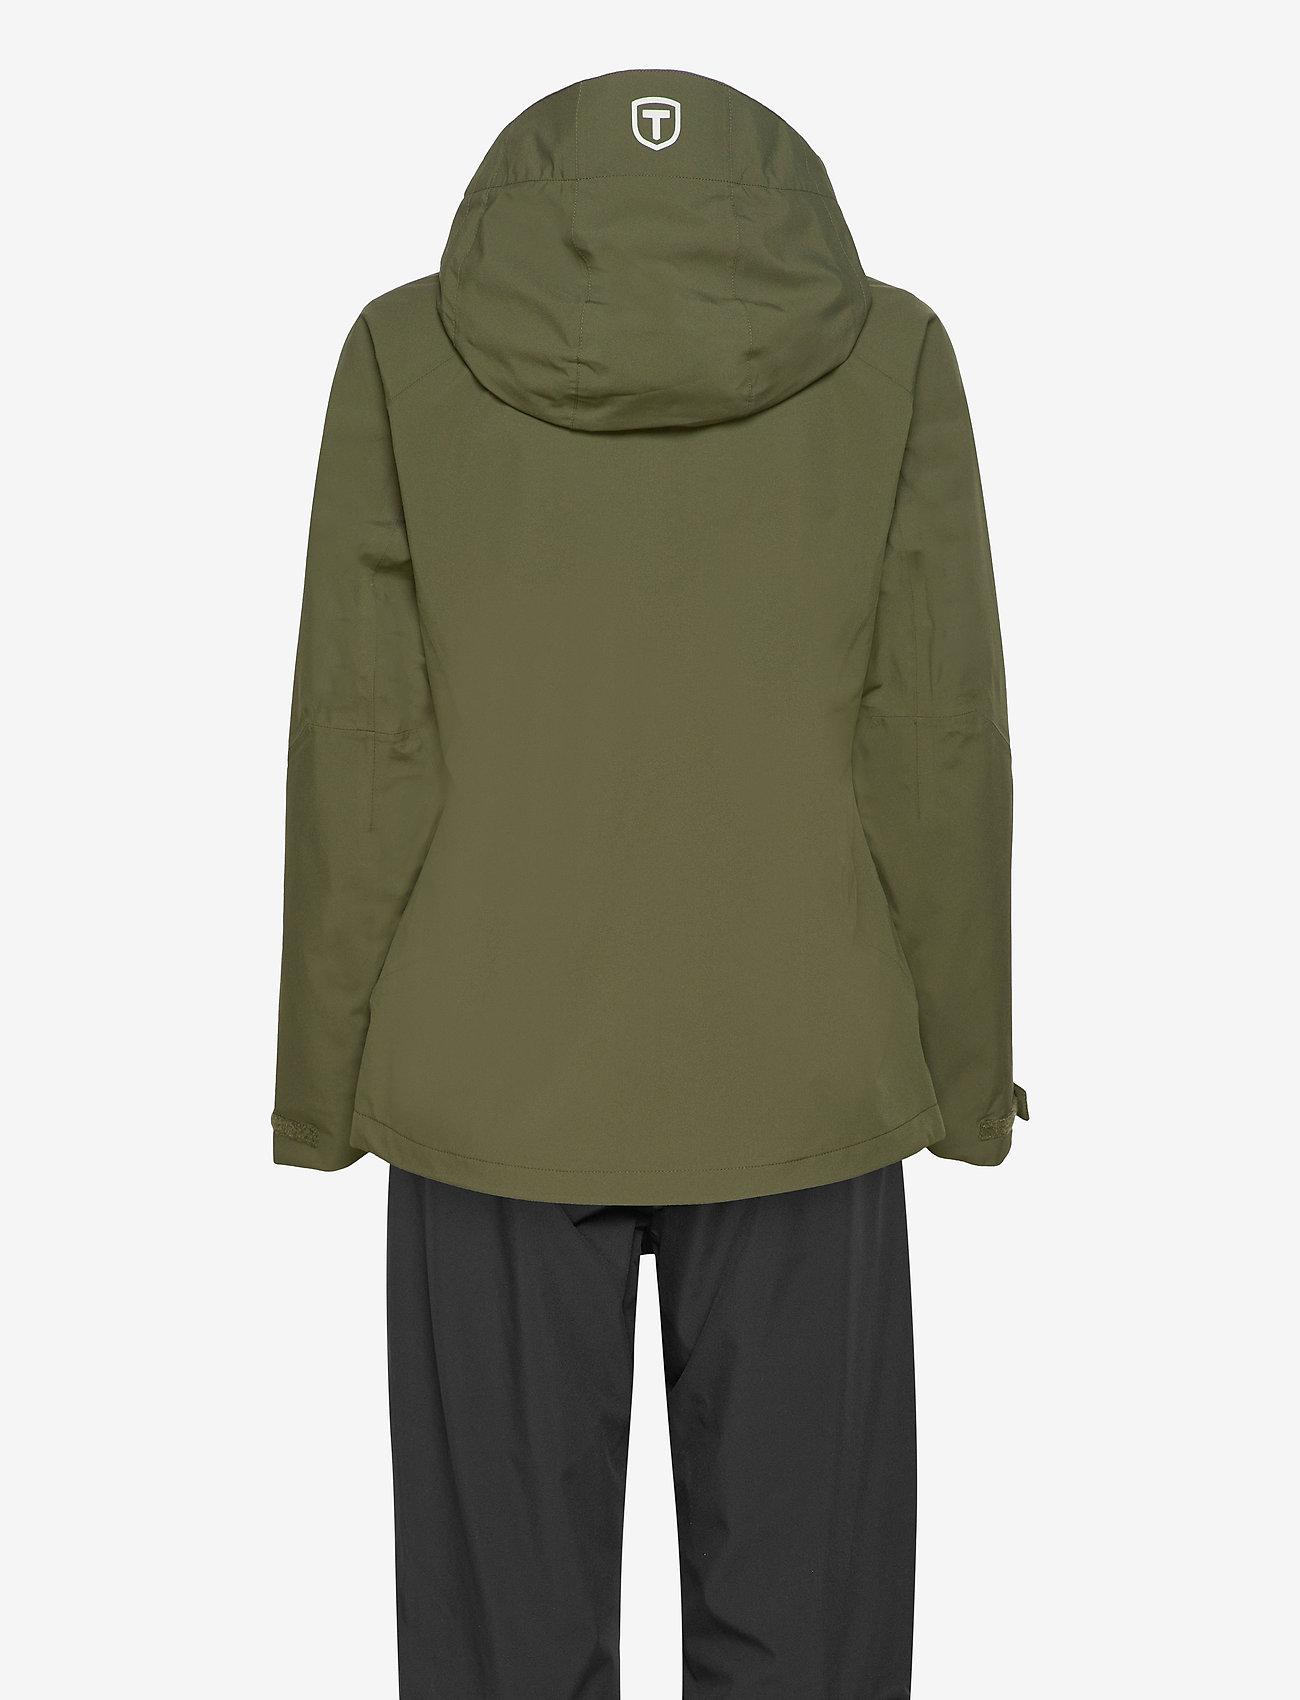 Tenson - HURRICANE XP SET W - manteaux de pluie - khaki - 1